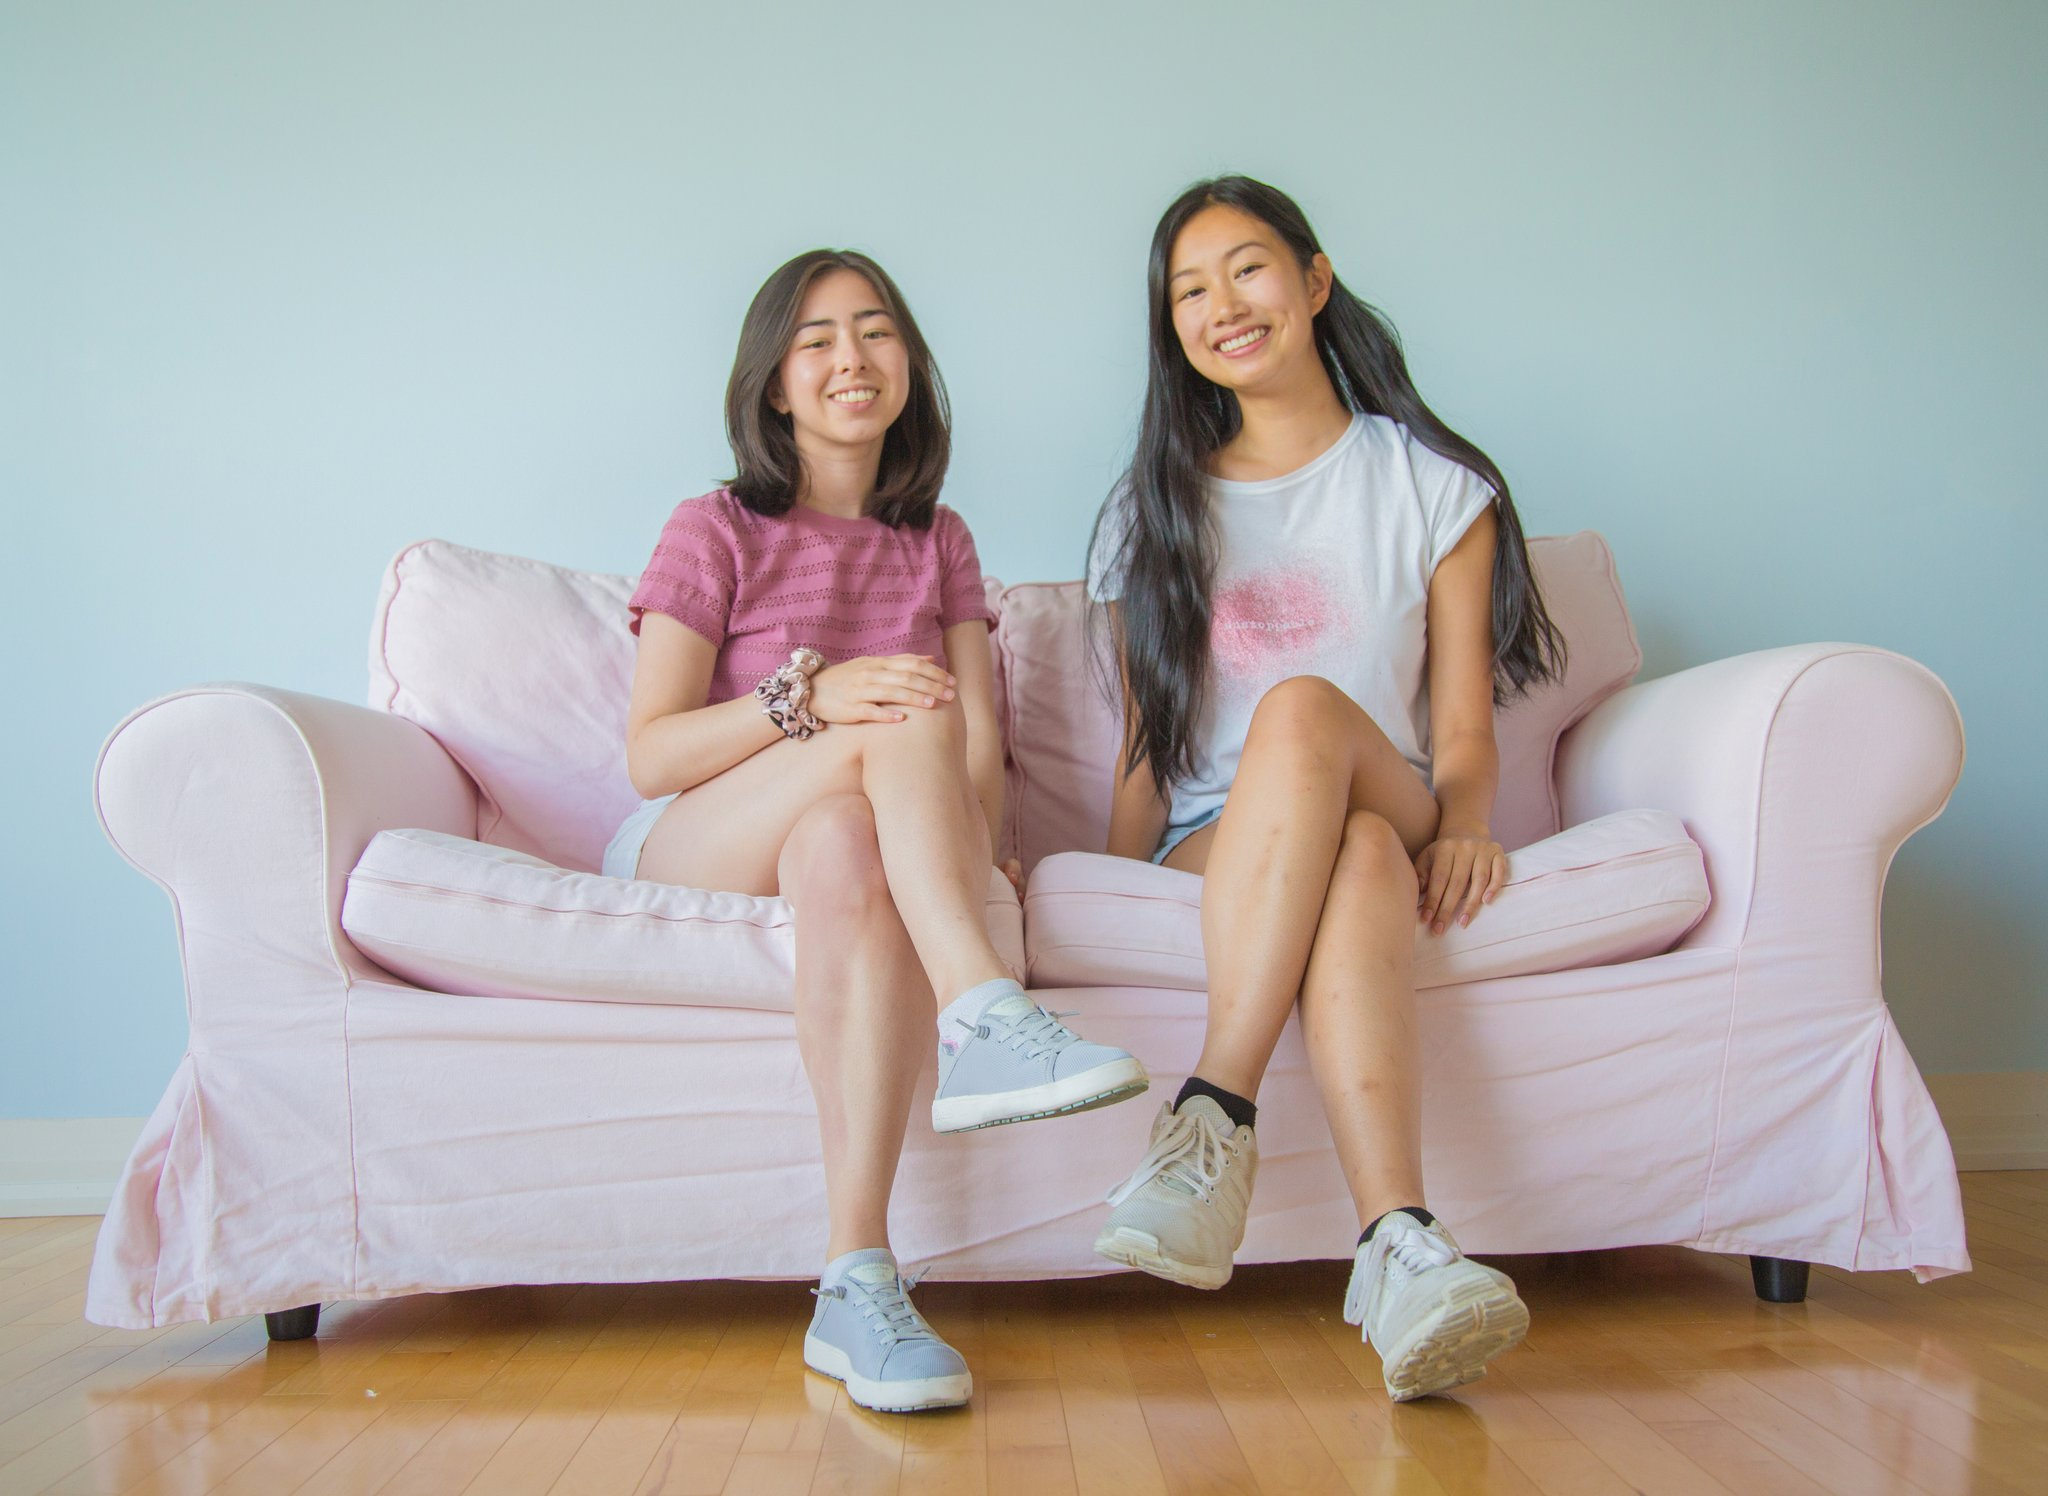 Meet #LeadingLadies Jessica Miao and Chloe Beaudoin: Founders Of Apricotton